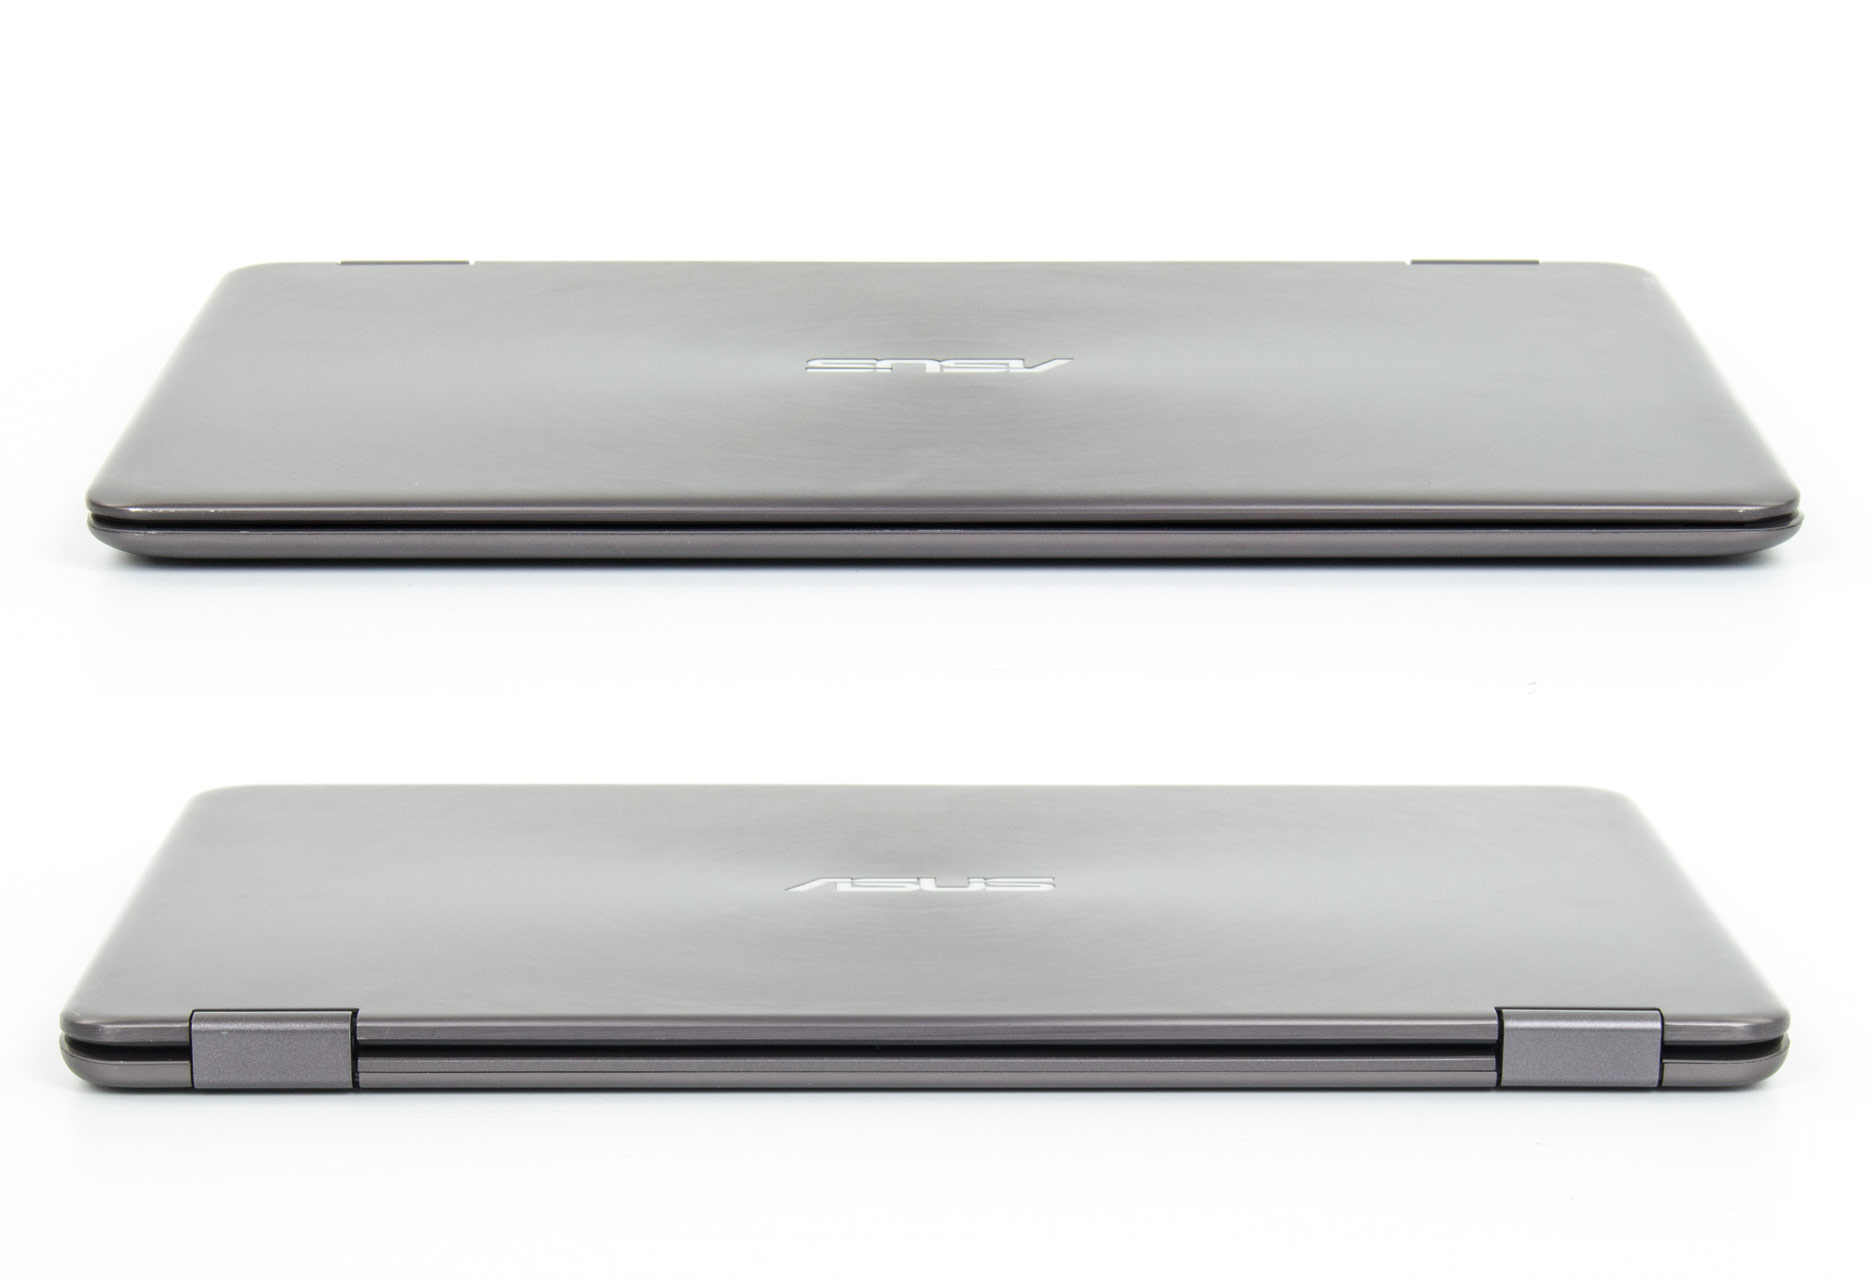 Asus Zenbook Flip UX360CA przód i tył